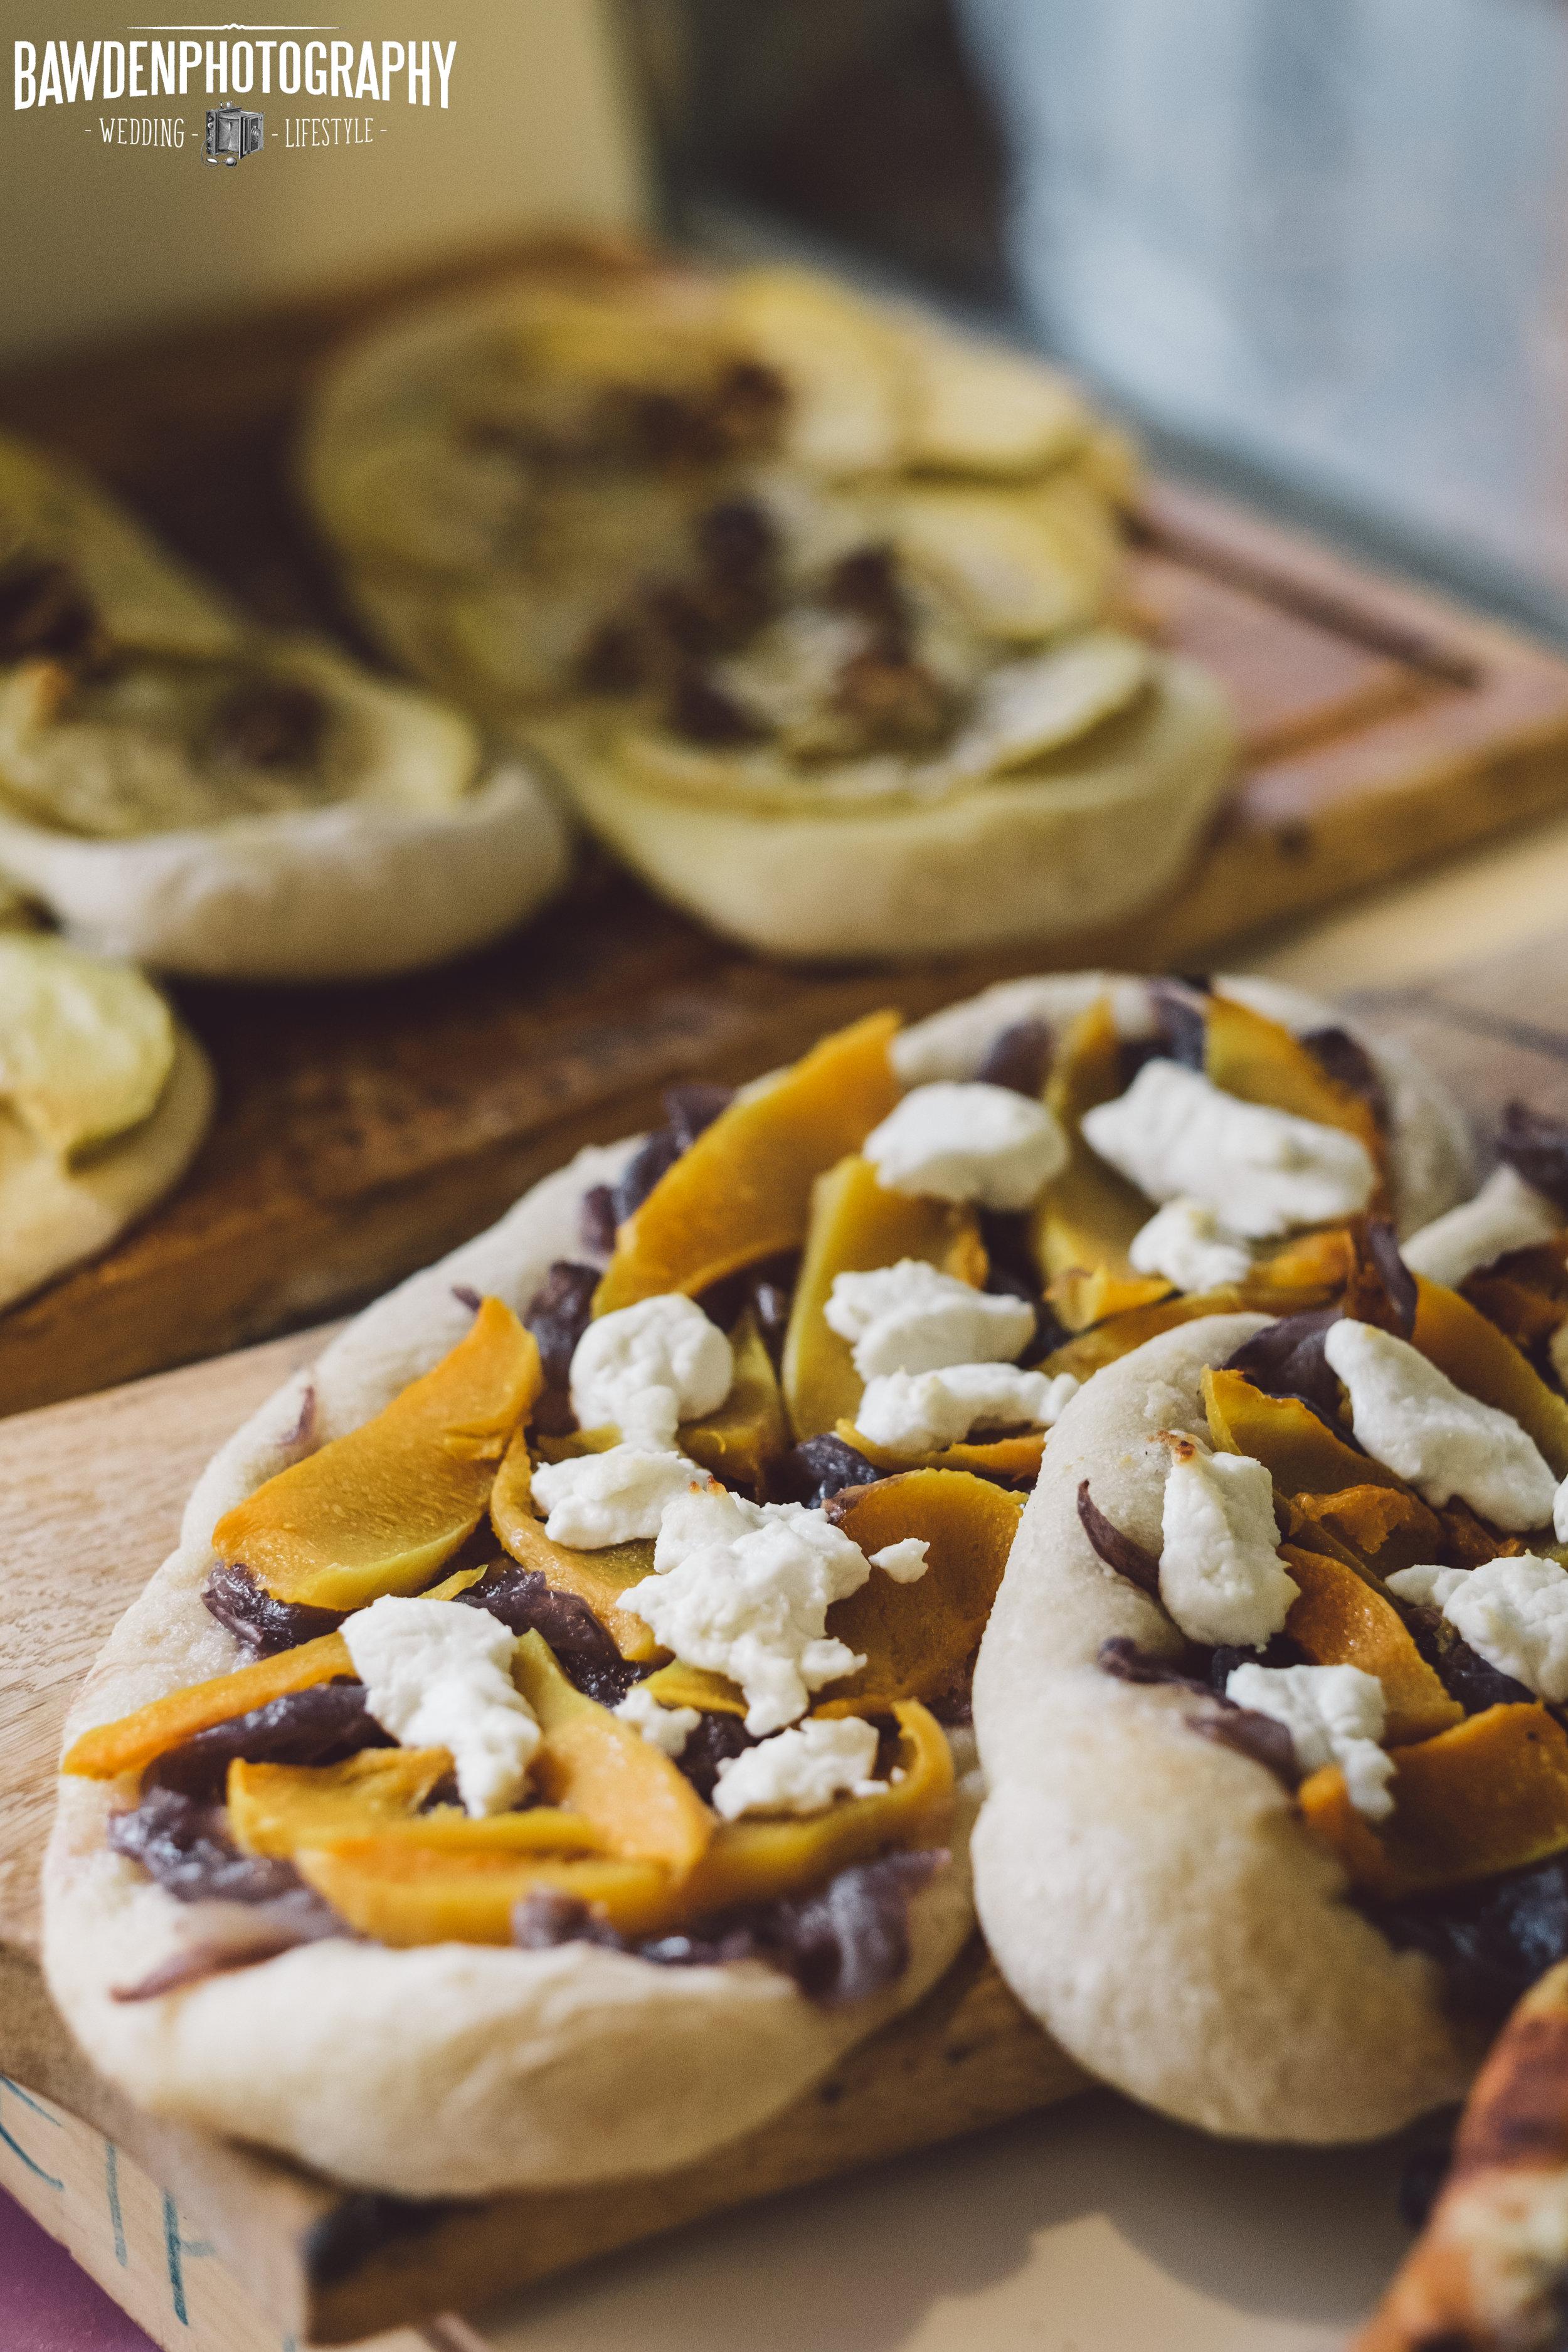 Filberts Bakery-1-2.jpg